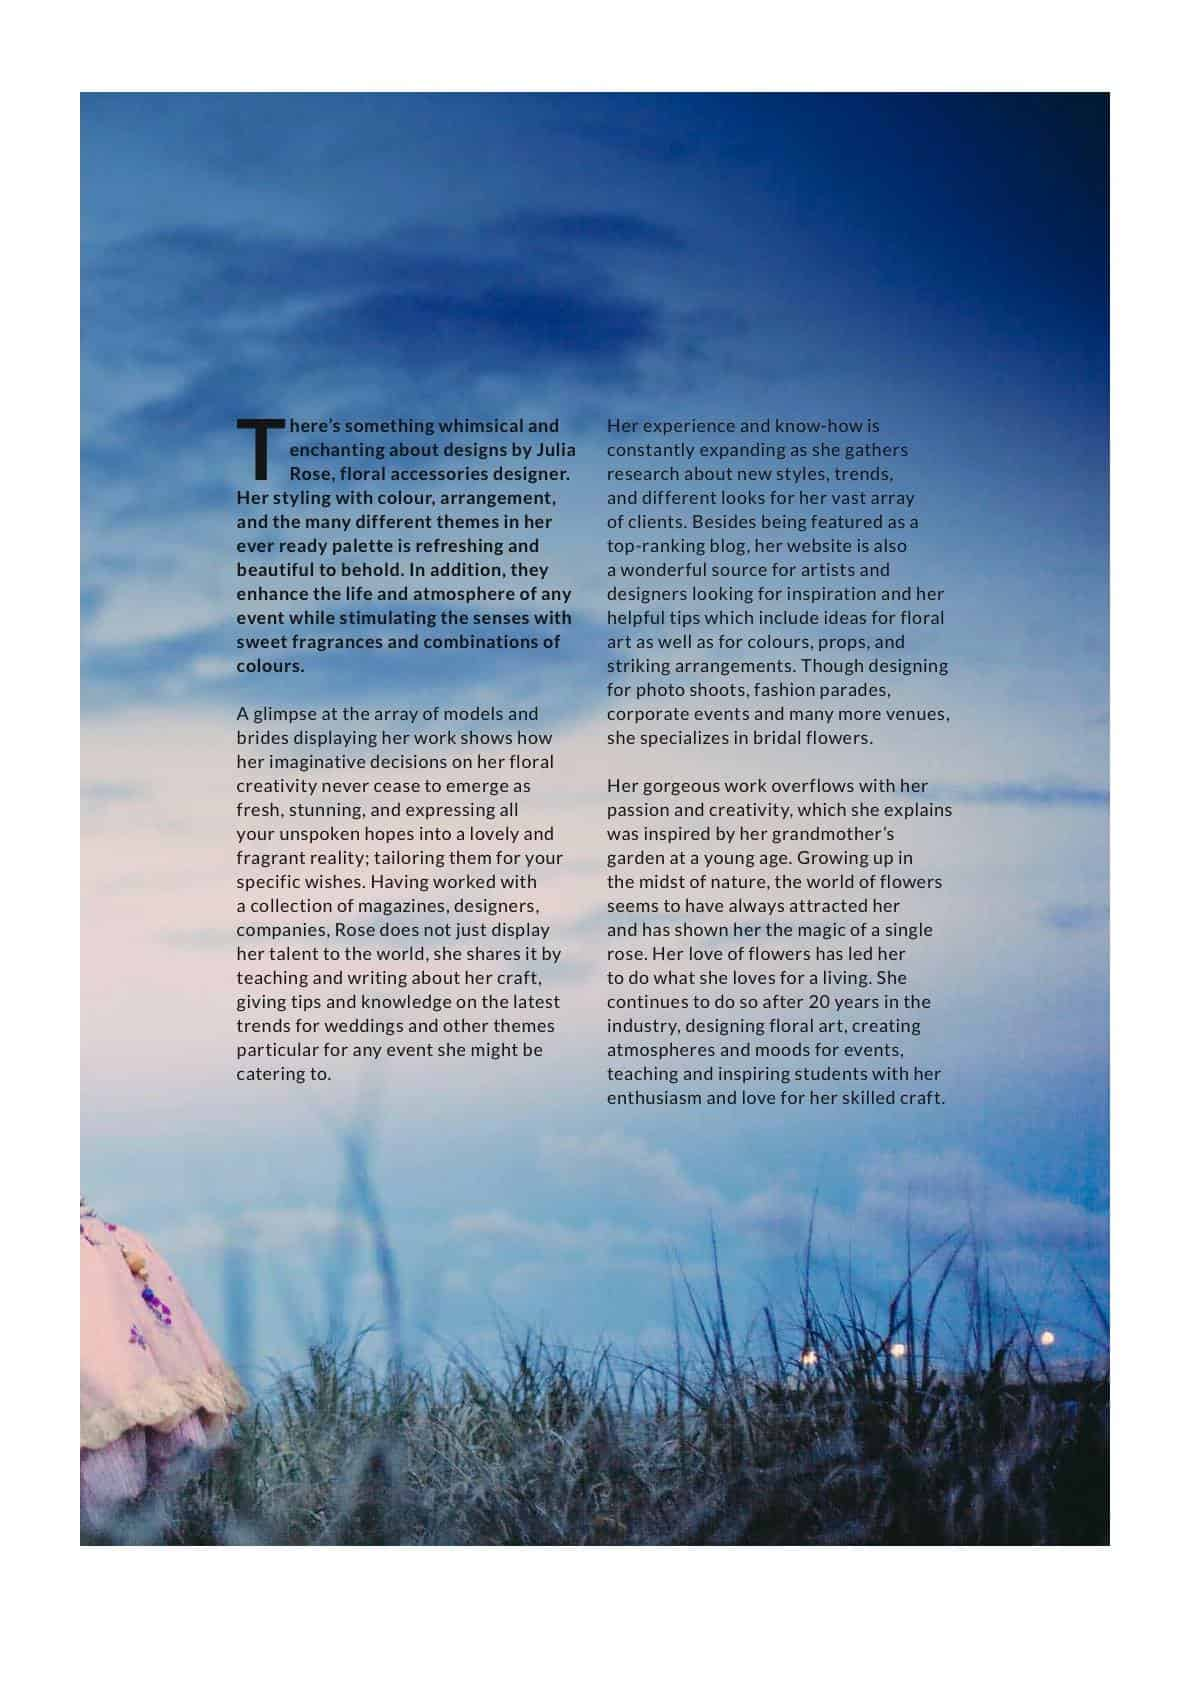 Envie Magazine - worlwide print - Wedding Flowers by Julia rose